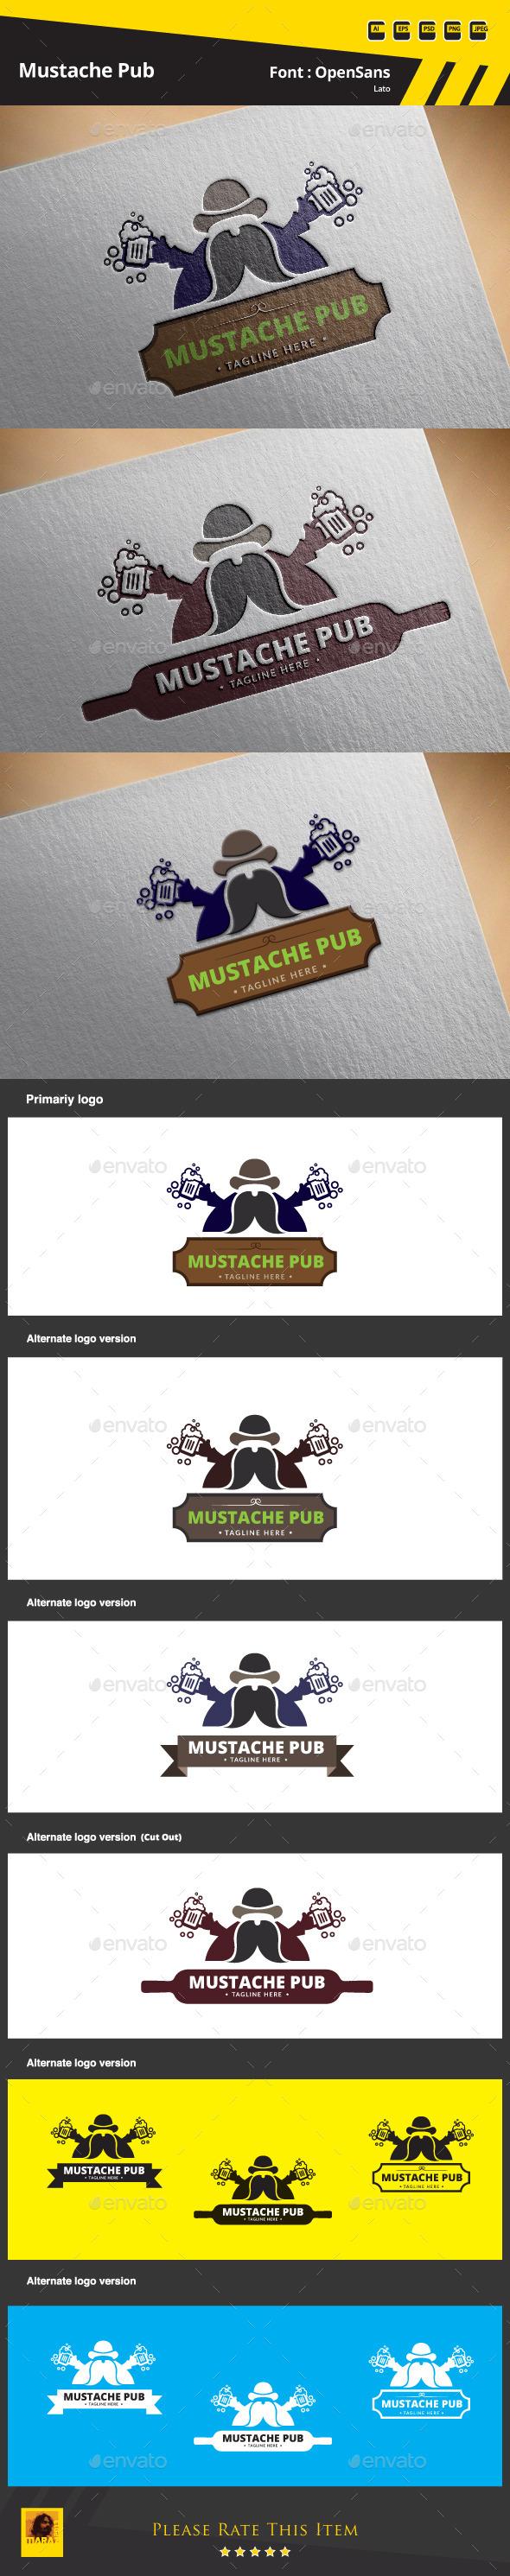 Mustache Pub Logo Template - Food Logo Templates